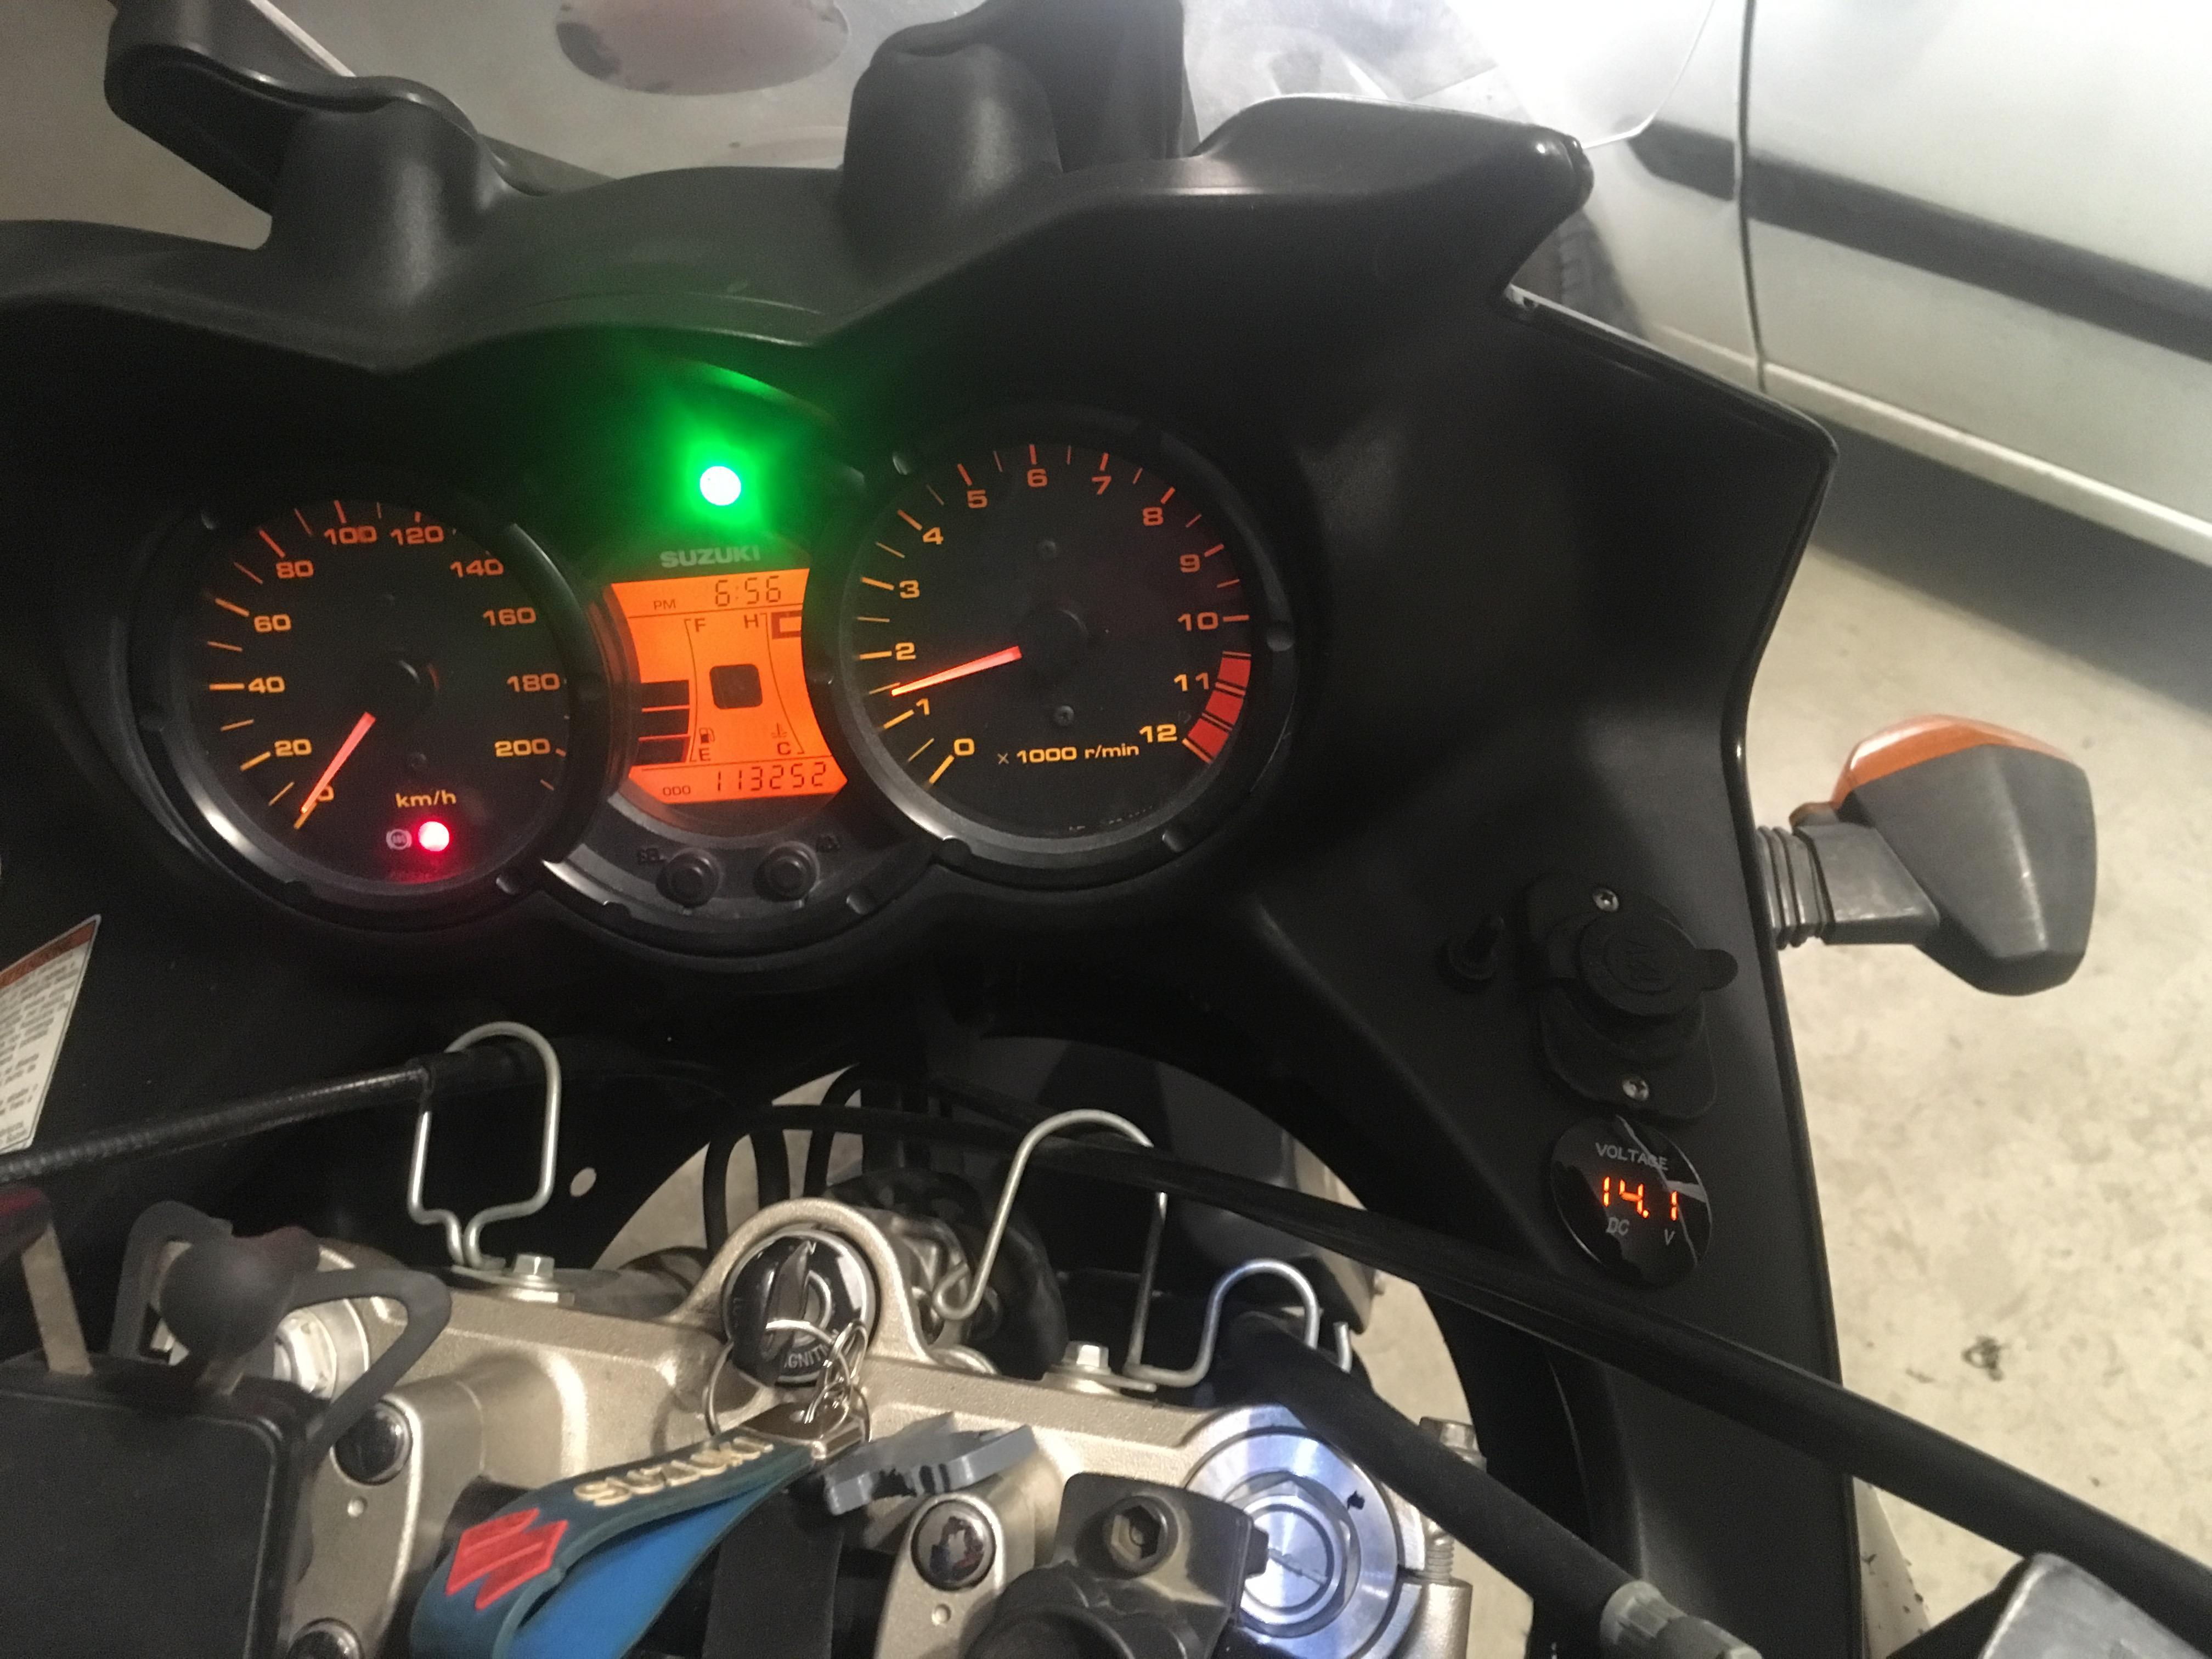 Suzuki v-strom dl650-dl1000 Dijital Su geçirmez Voltmetre uygulaması